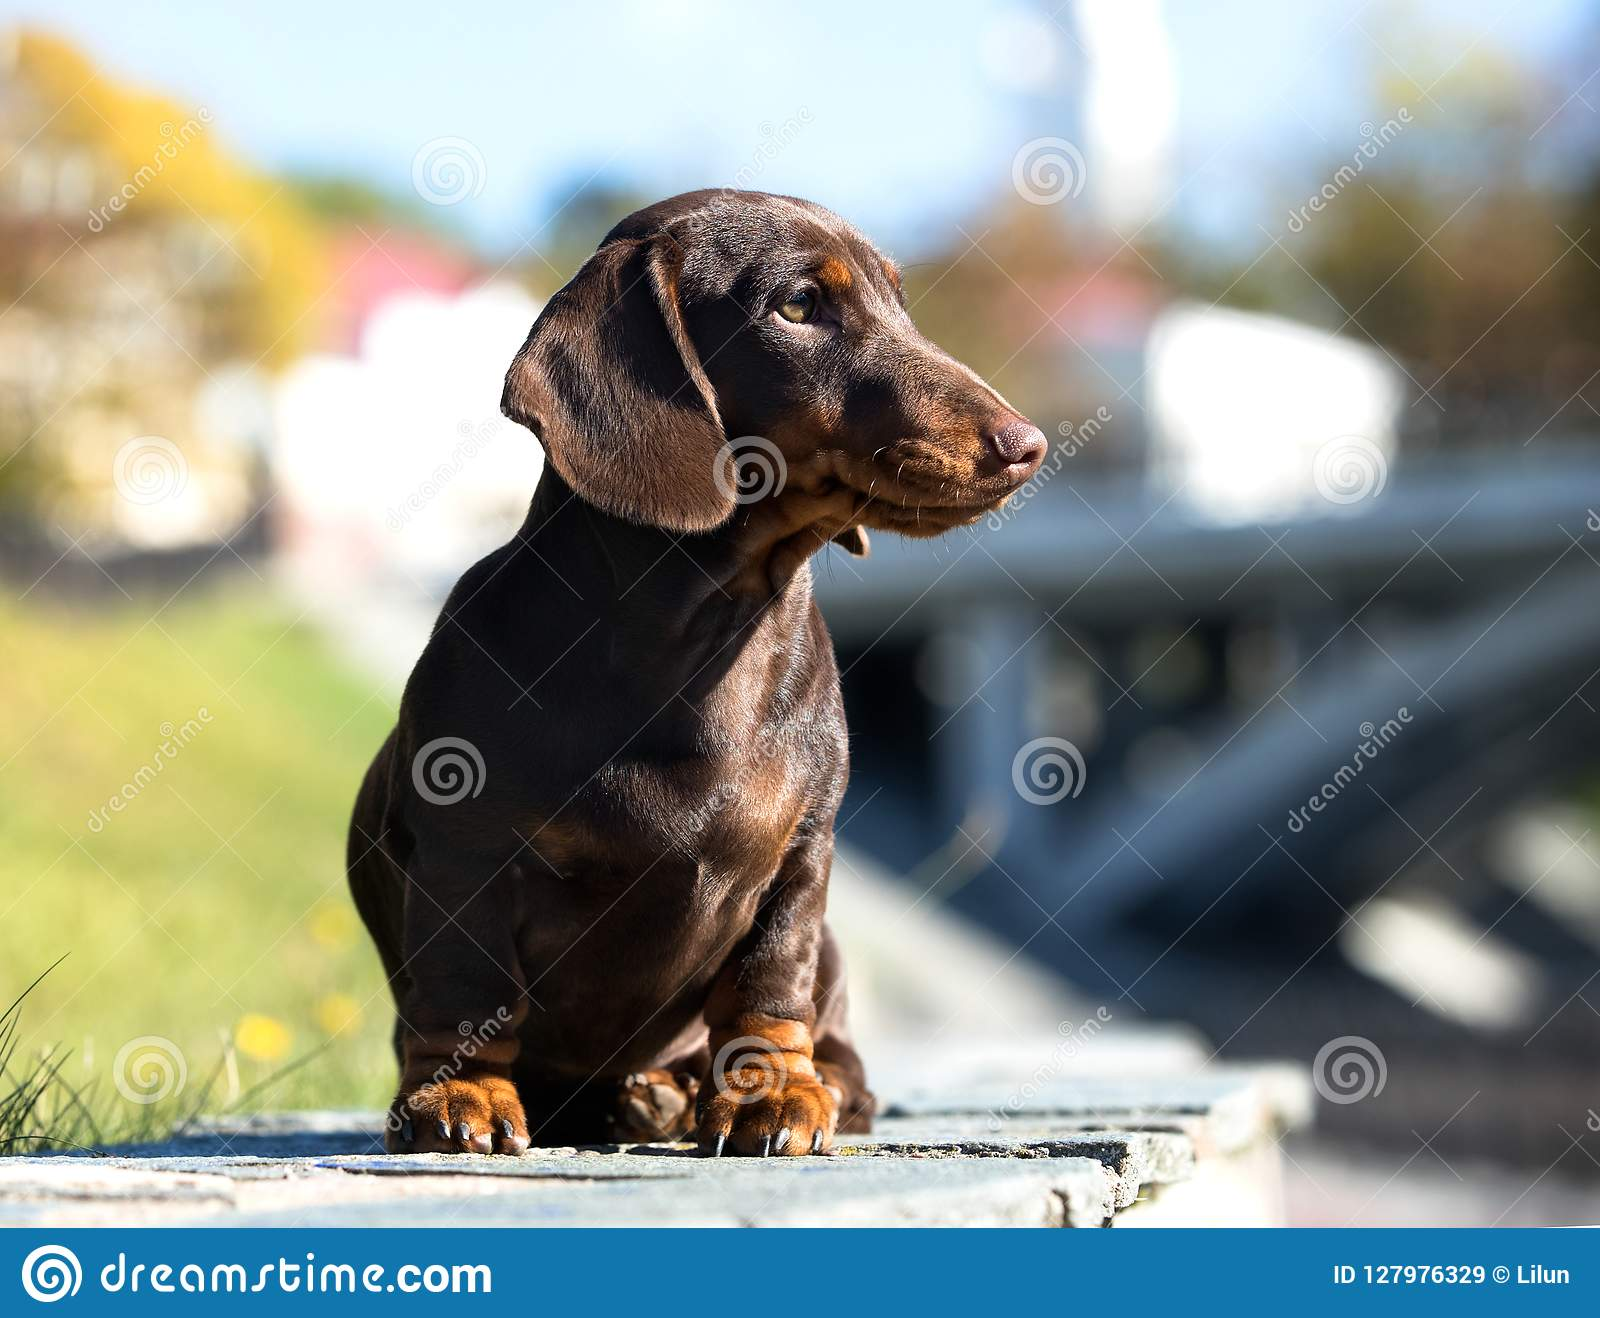 Dog Dachshund Brovn Colors Stock Image Image Of Animals 127976329